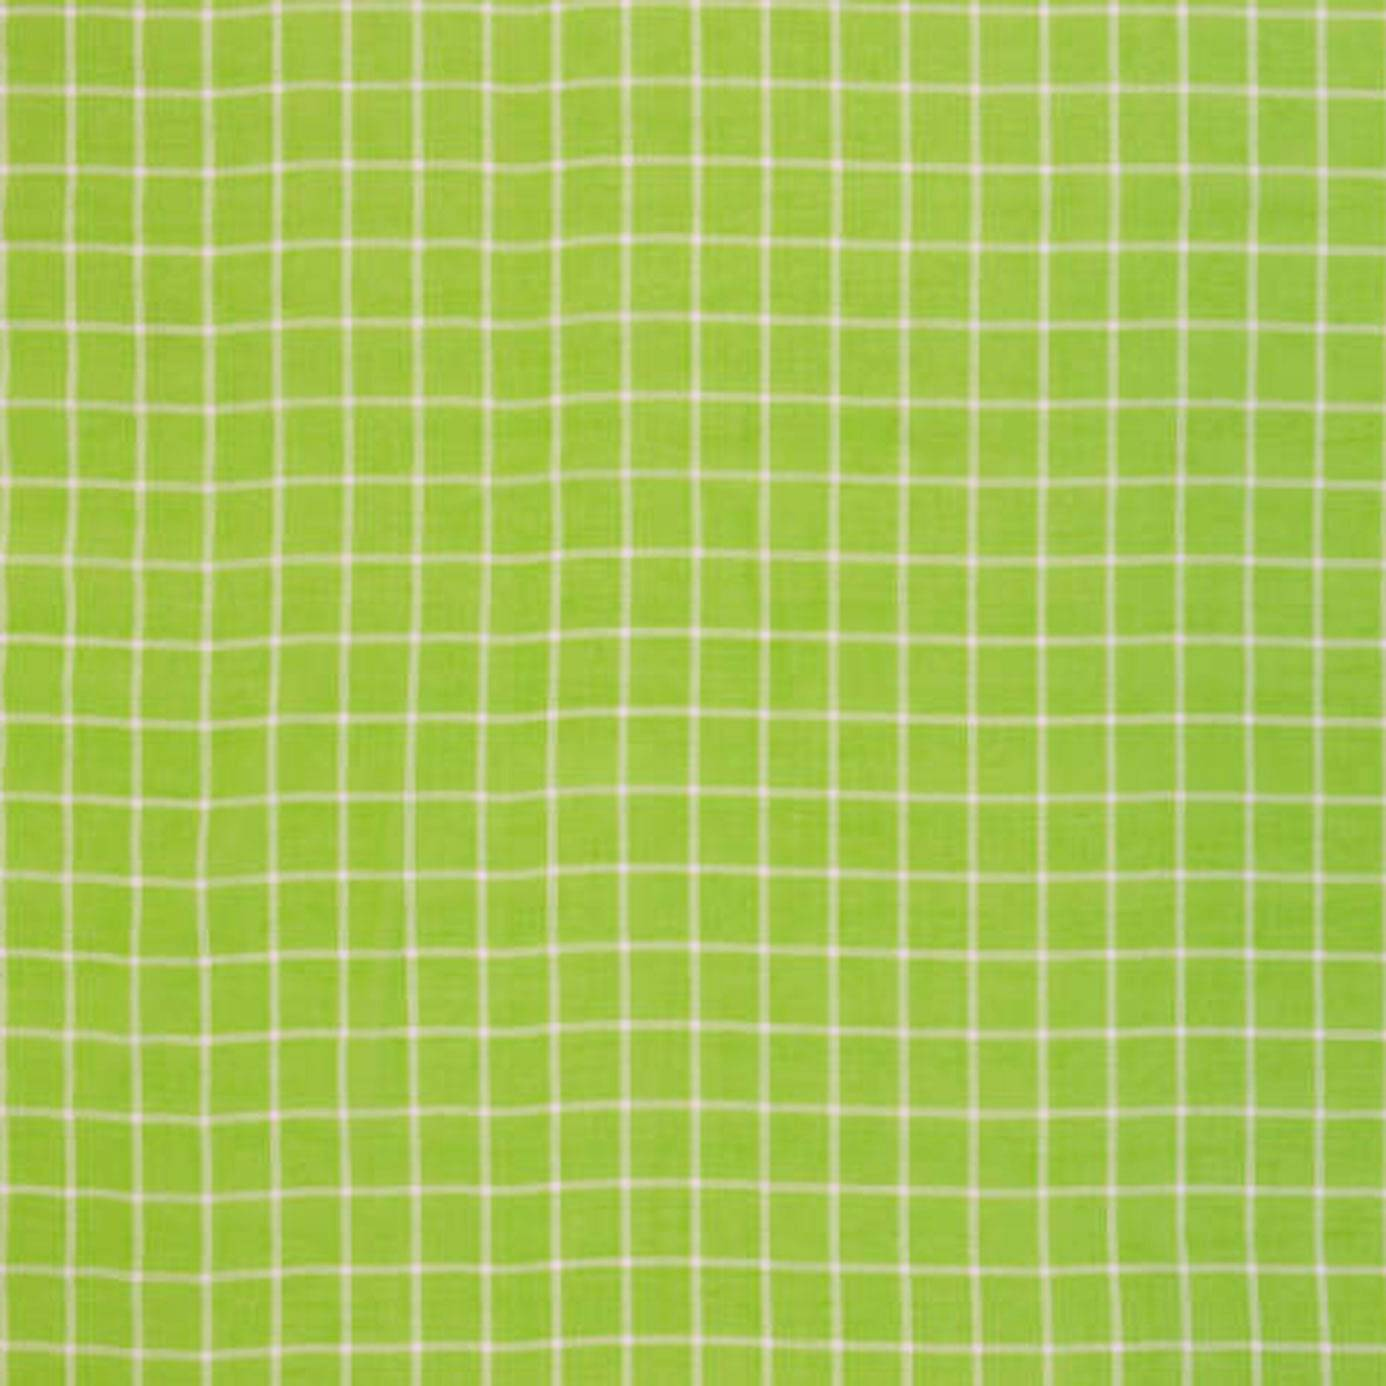 Curtains In Vernon Fabric Apple F1833 17 Designers Guild Around The World Fabrics